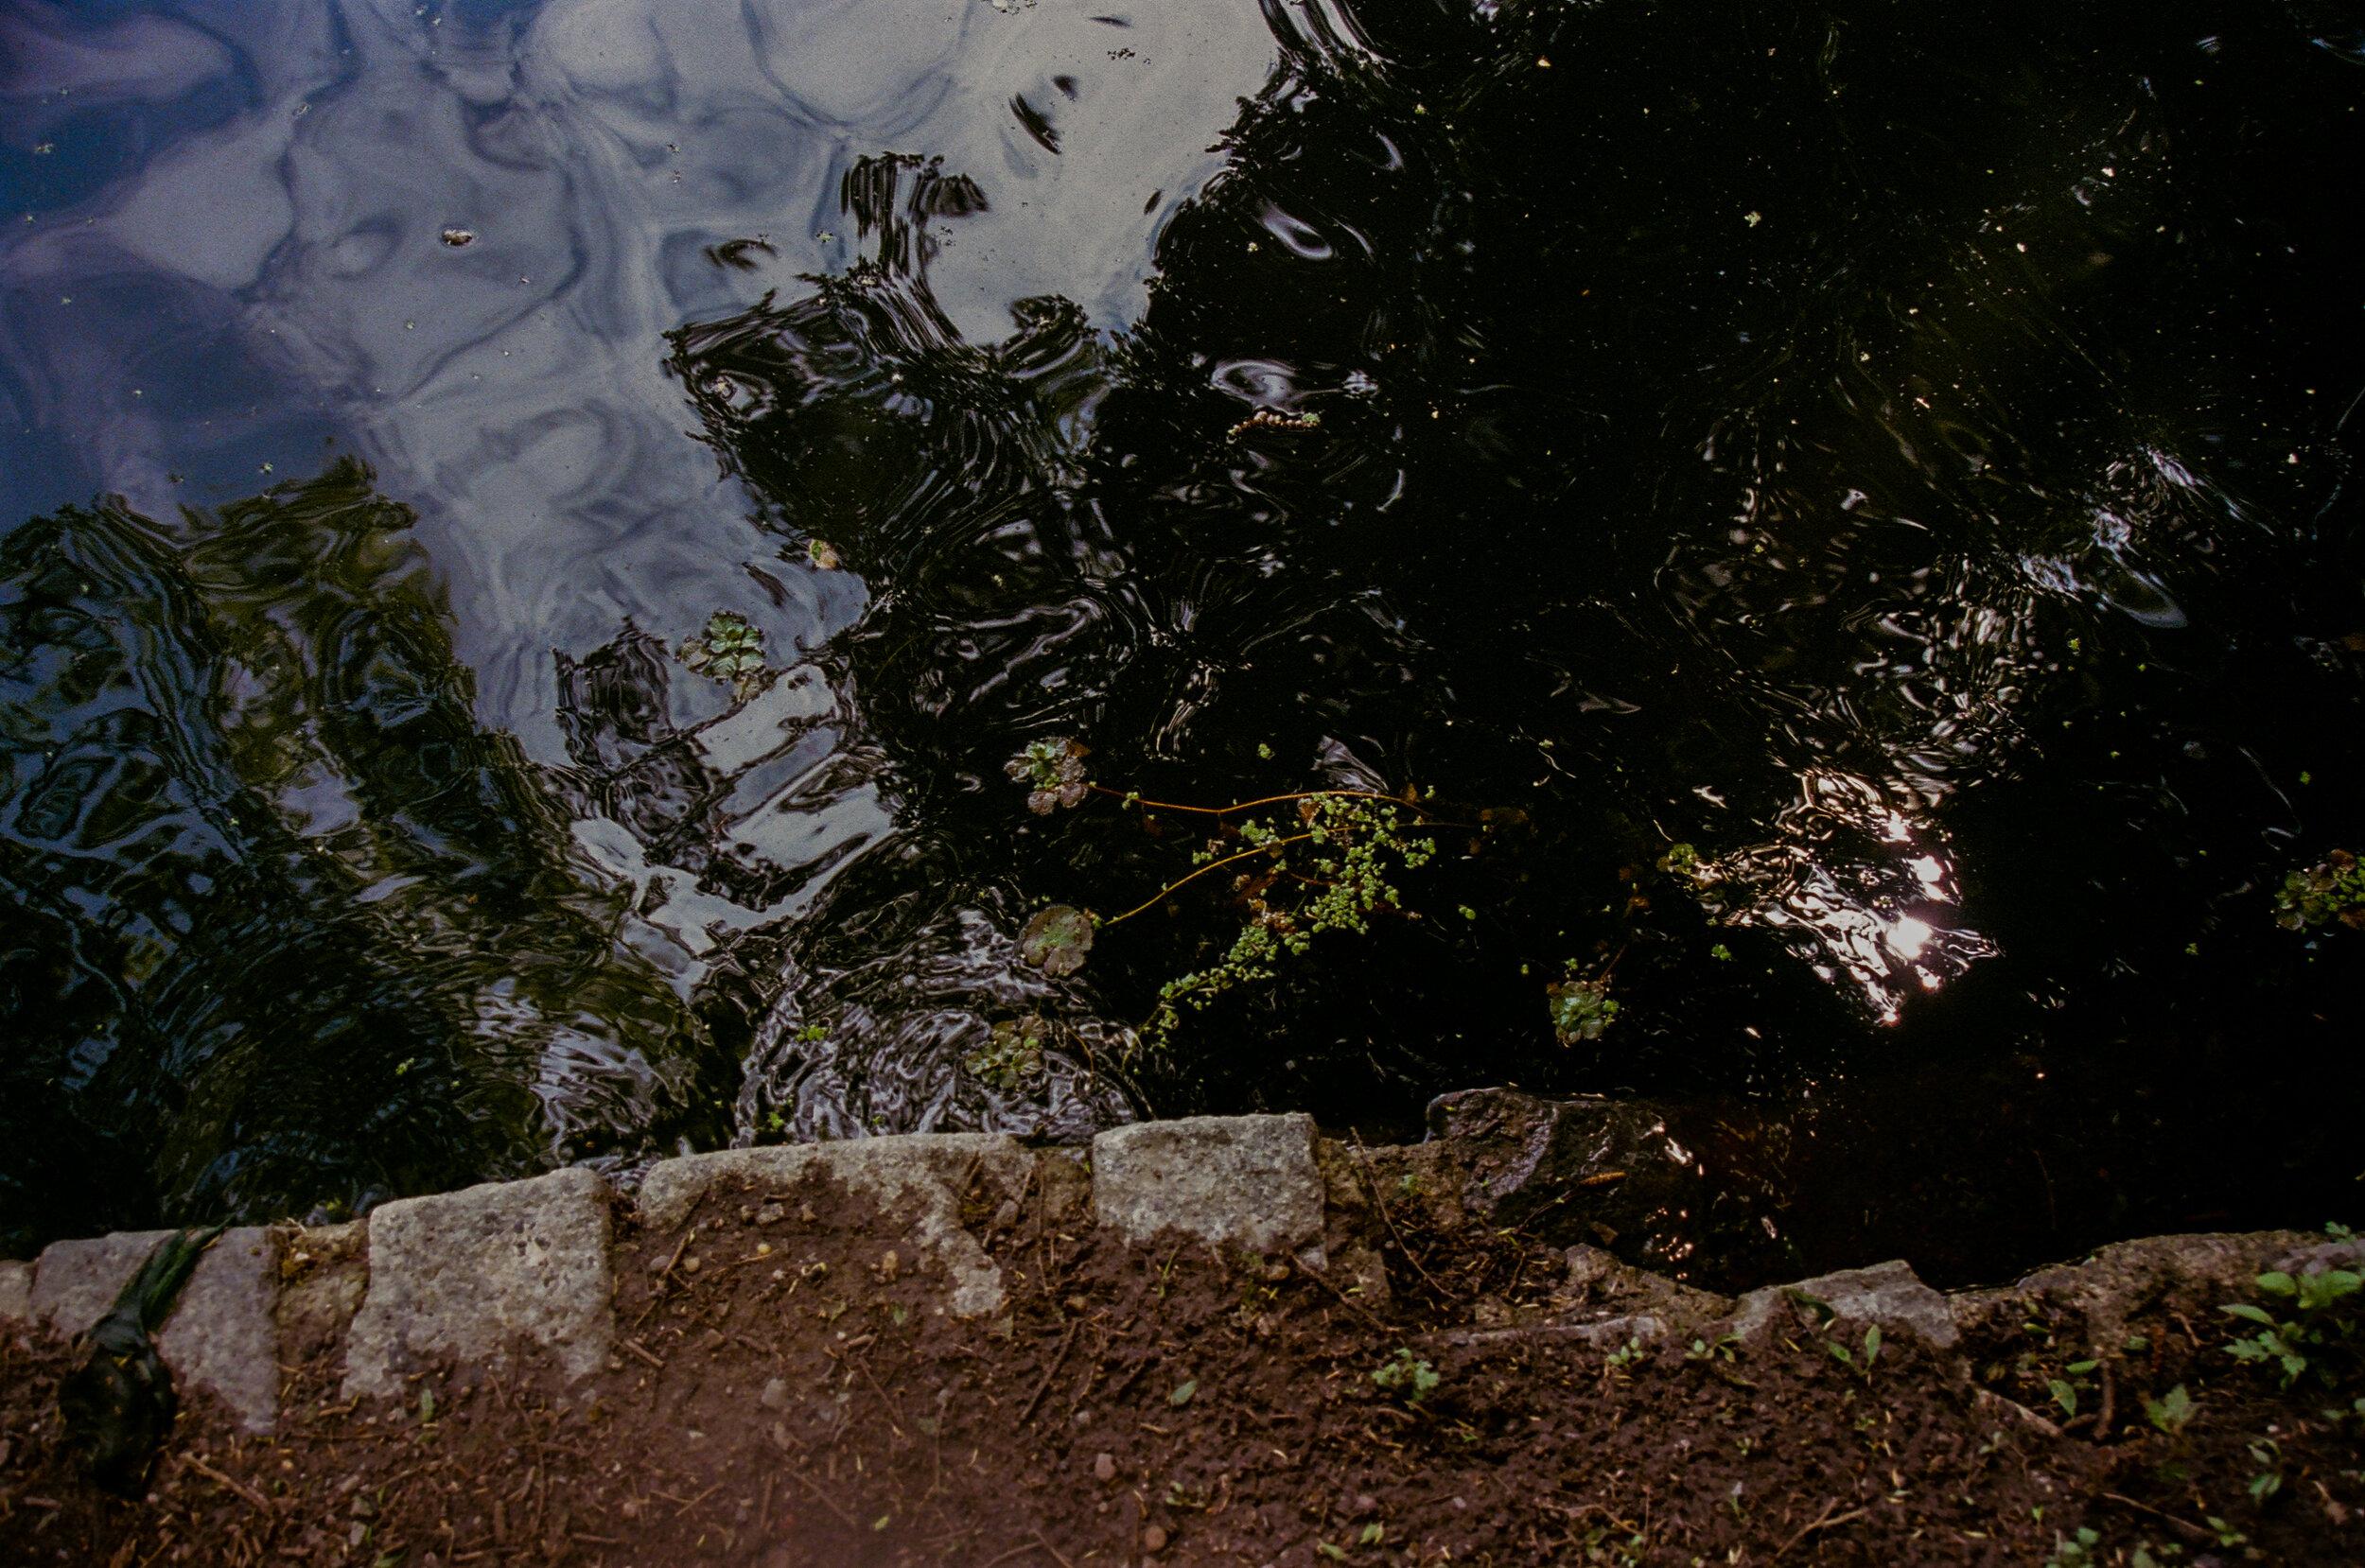 [pond.jpg